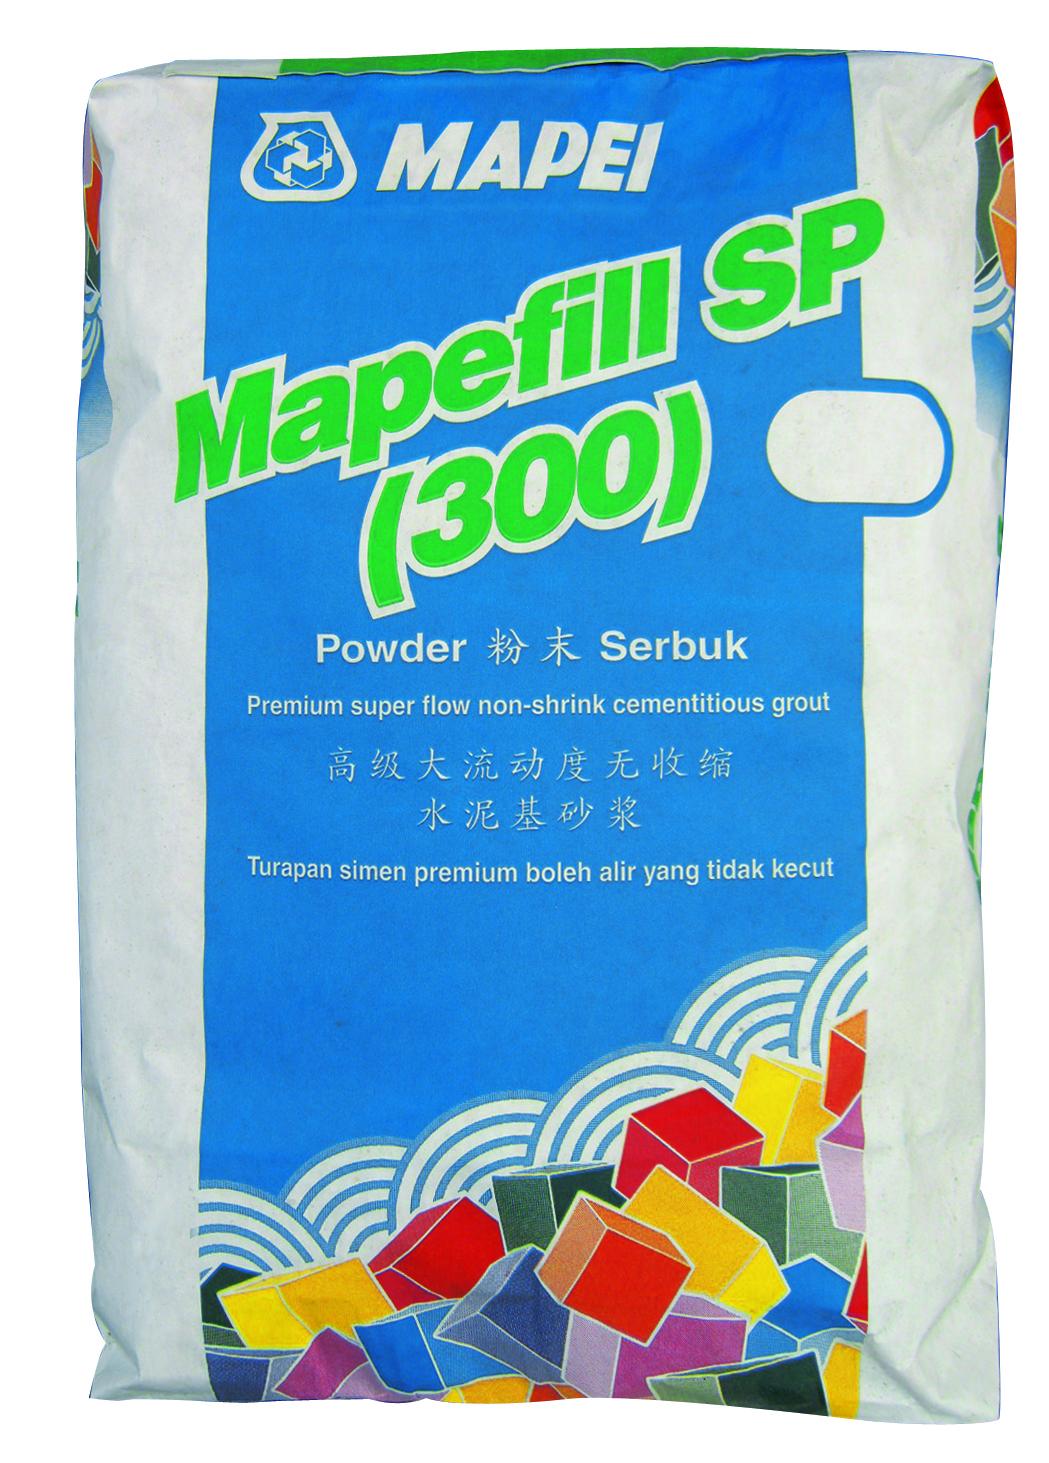 MAPEFILL SP